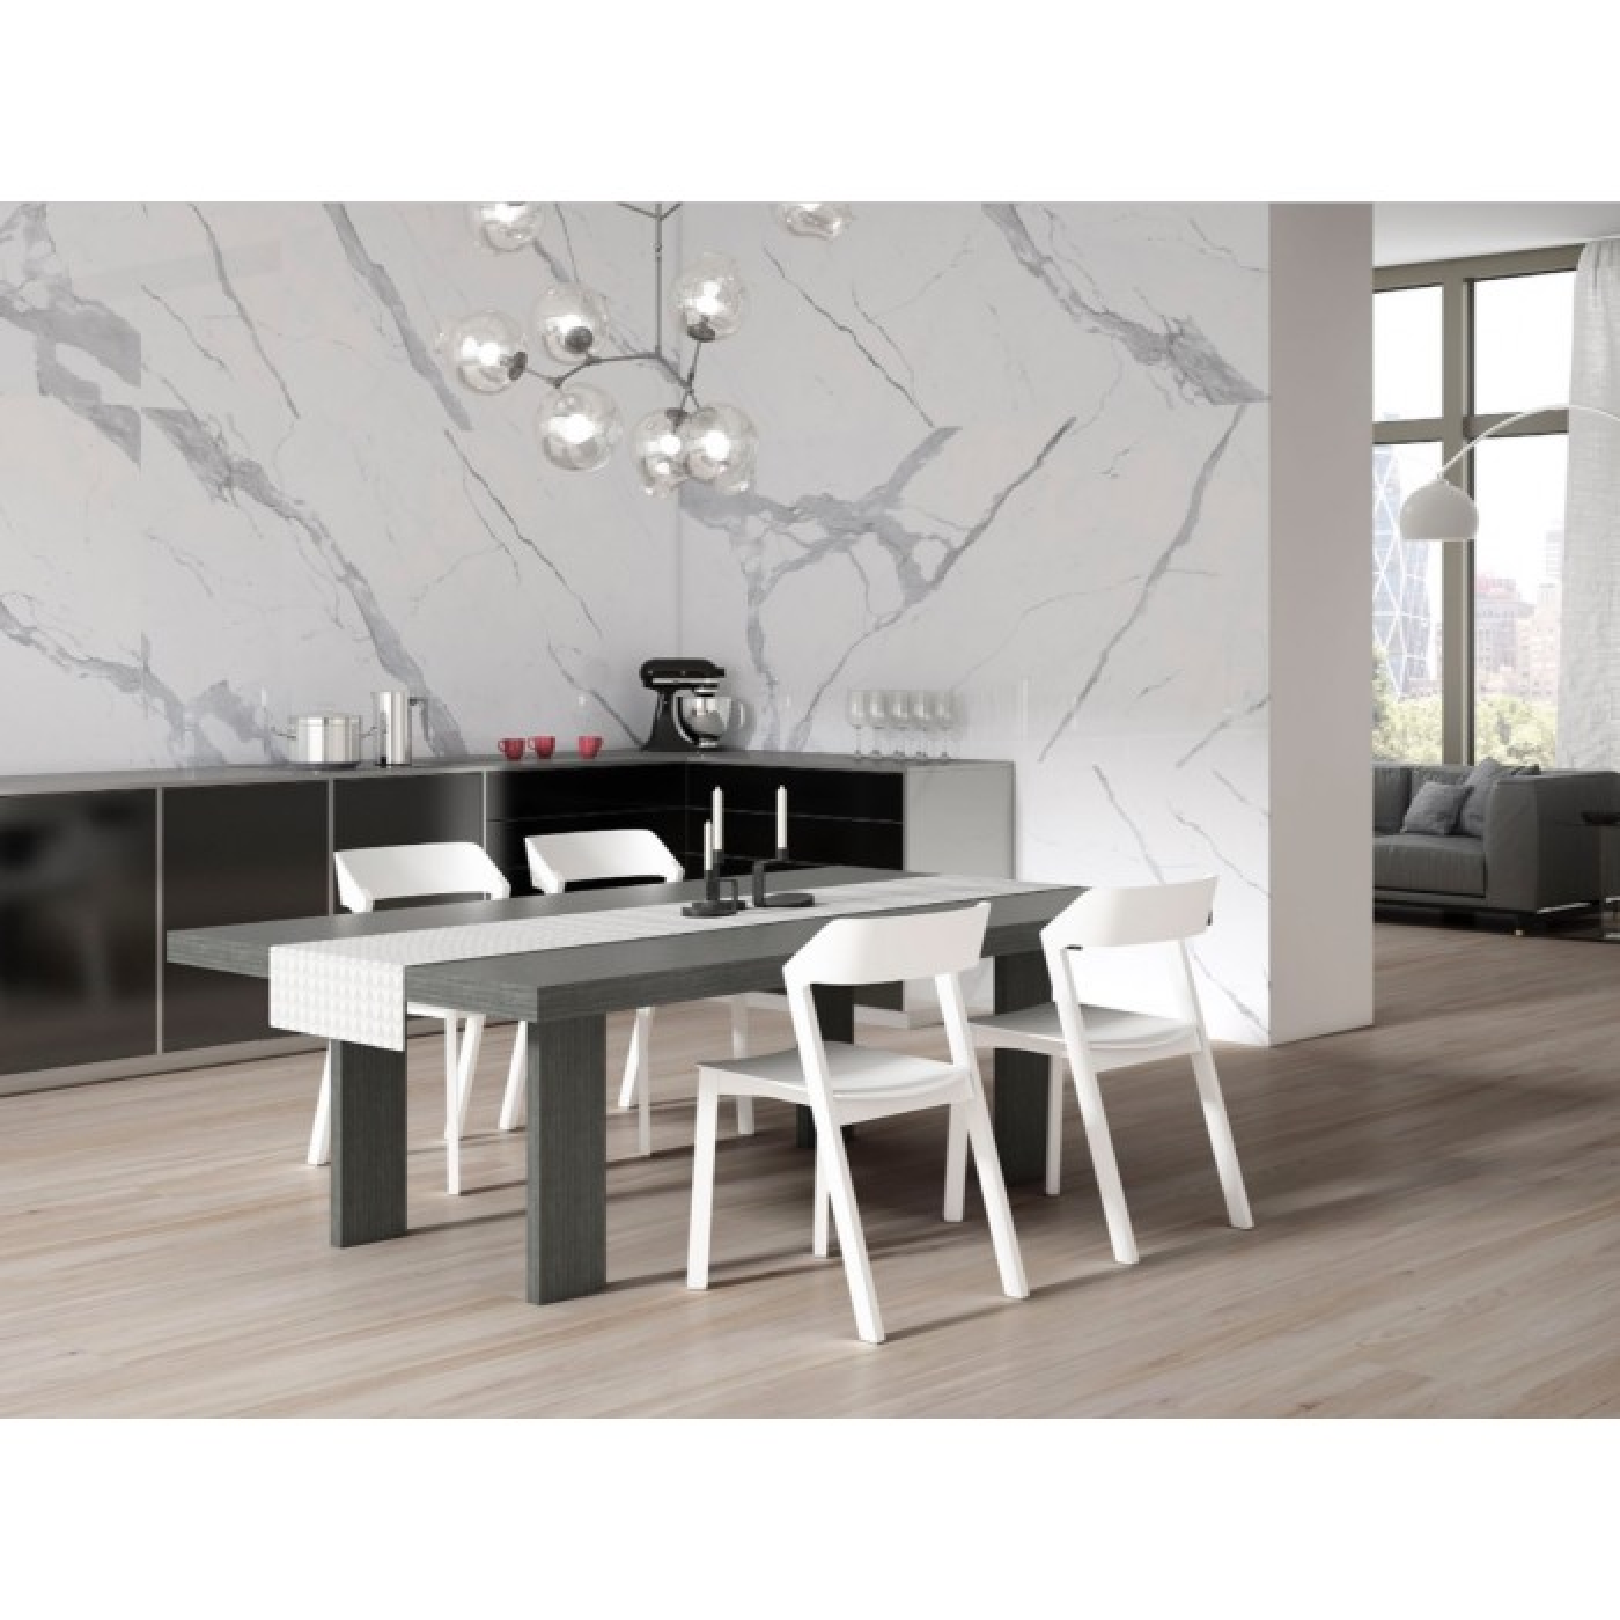 carrelage gr s c rame effet marbre statuary extra white rectifi casalux home design. Black Bedroom Furniture Sets. Home Design Ideas